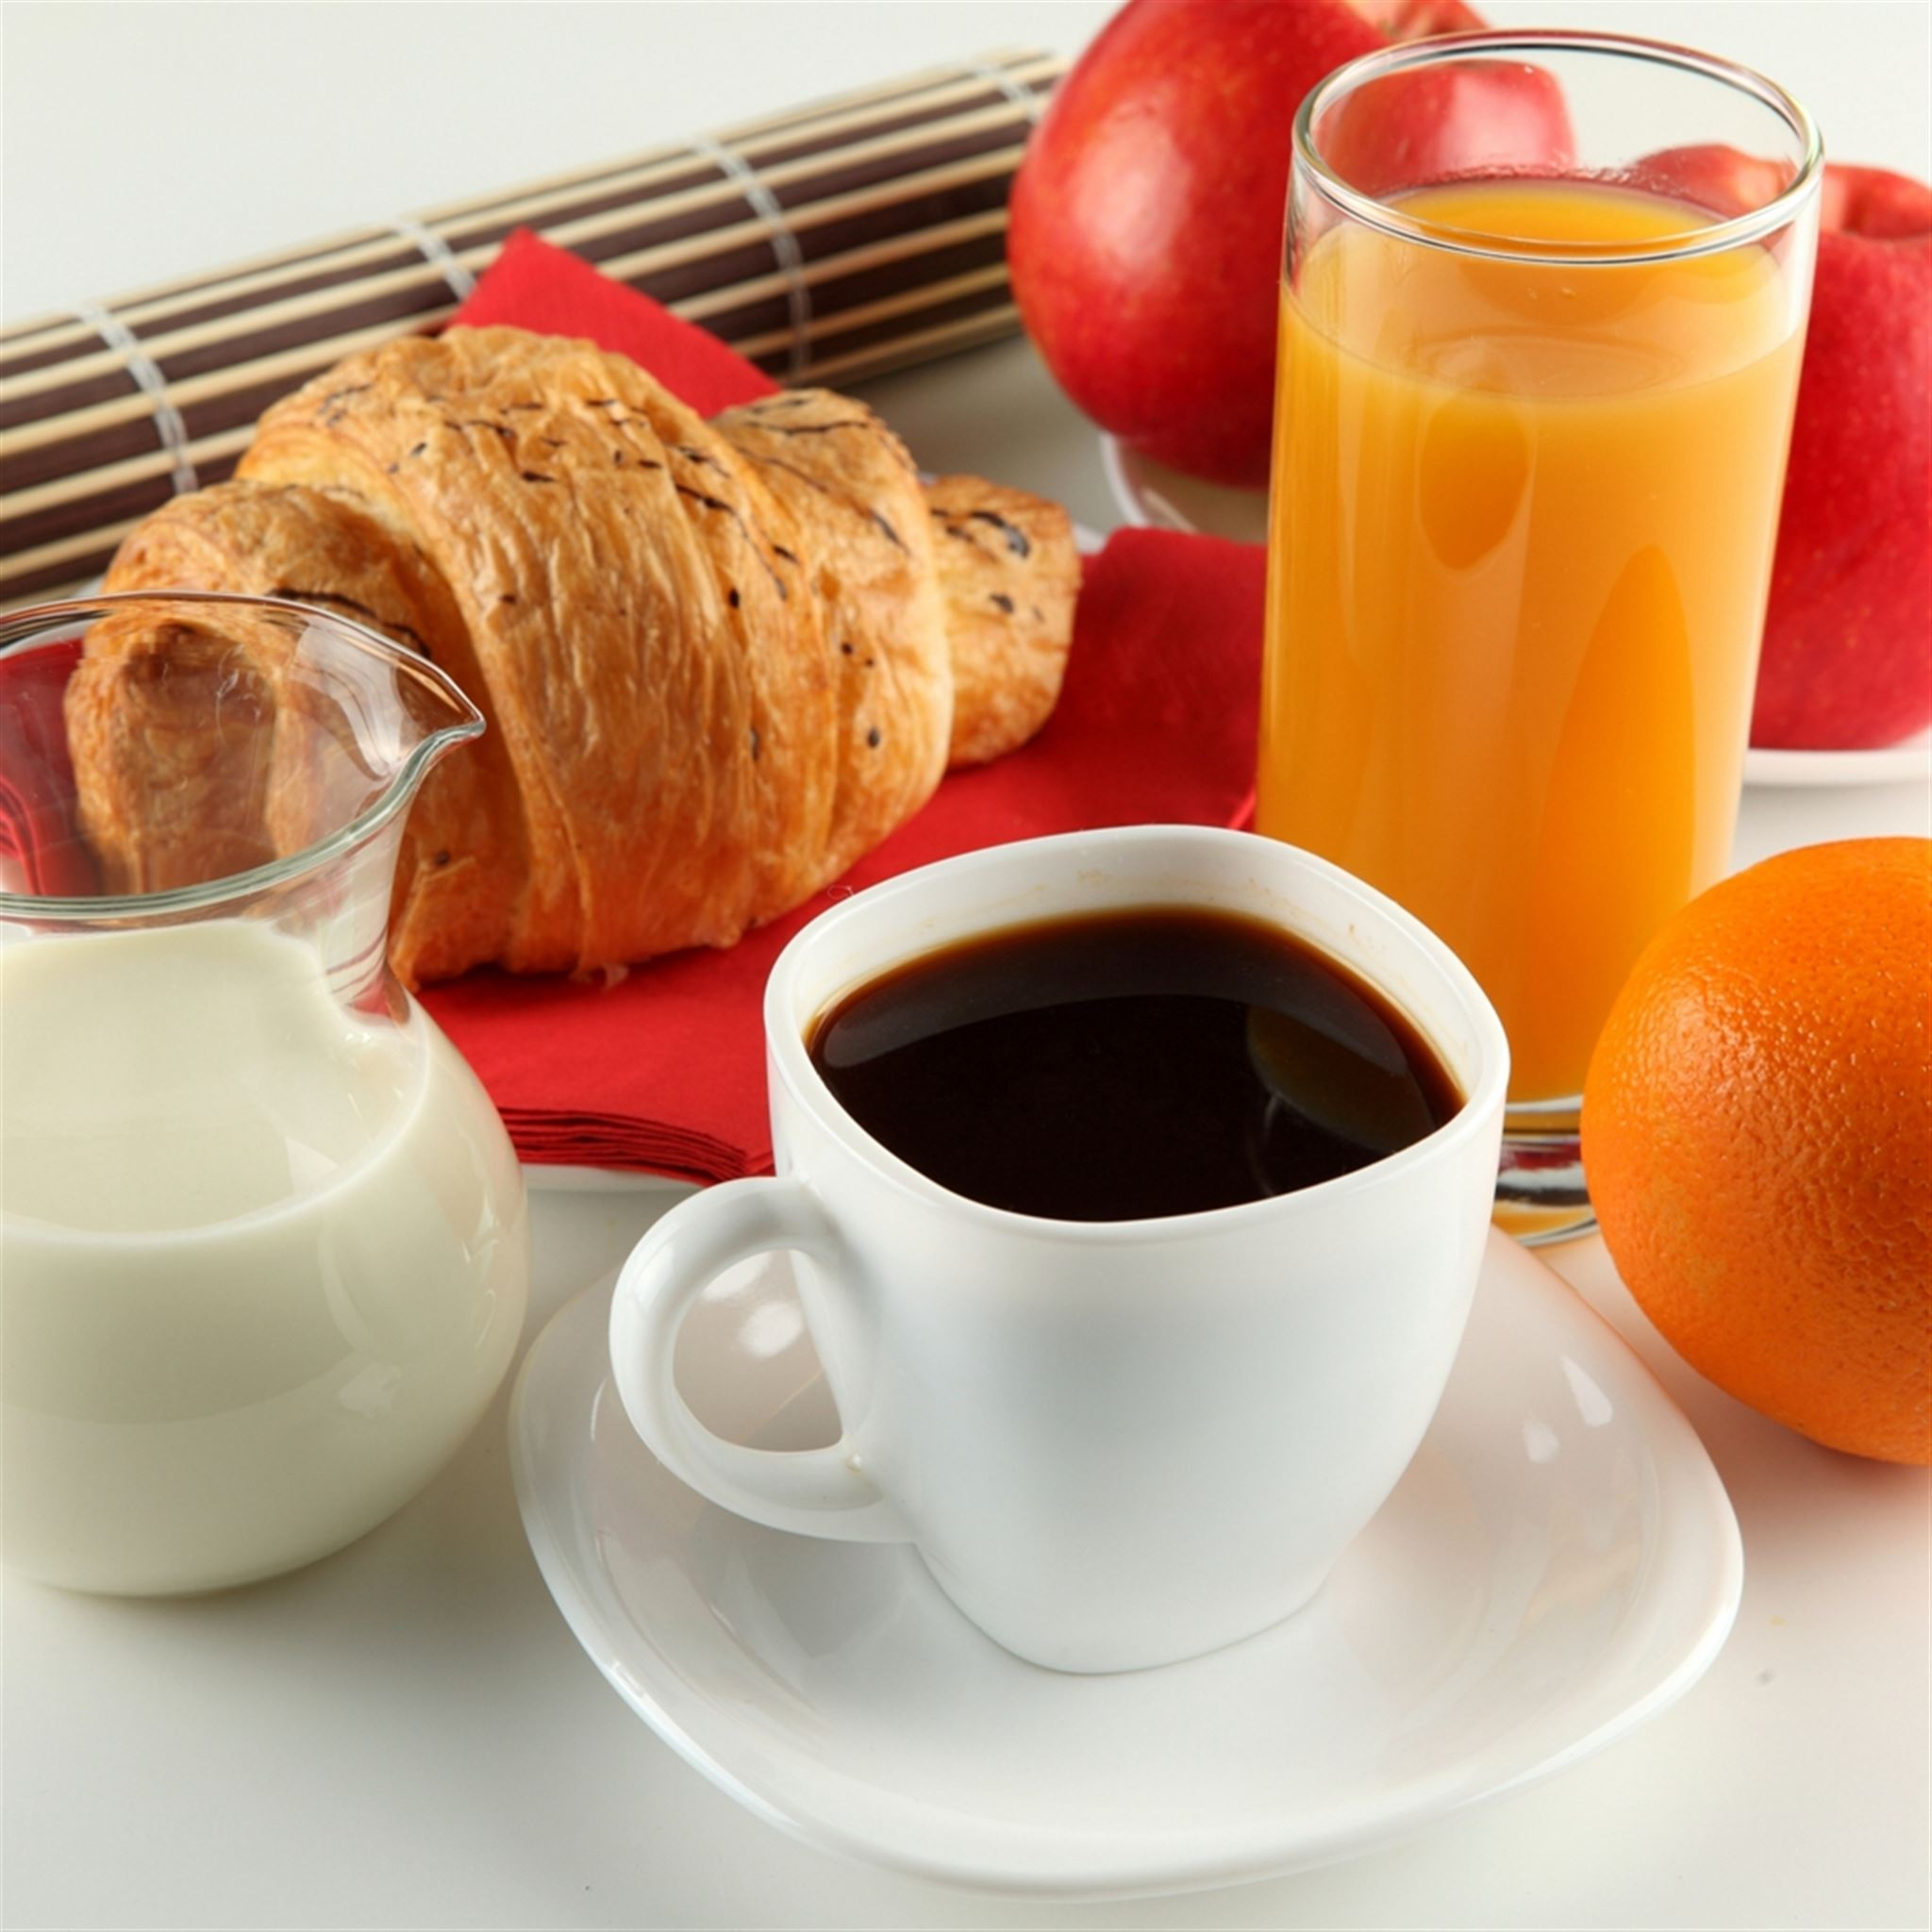 Breakfast Coffee Milk Orange Juice Croissant Apple Cup White Saucer Jug iPad wallpaper